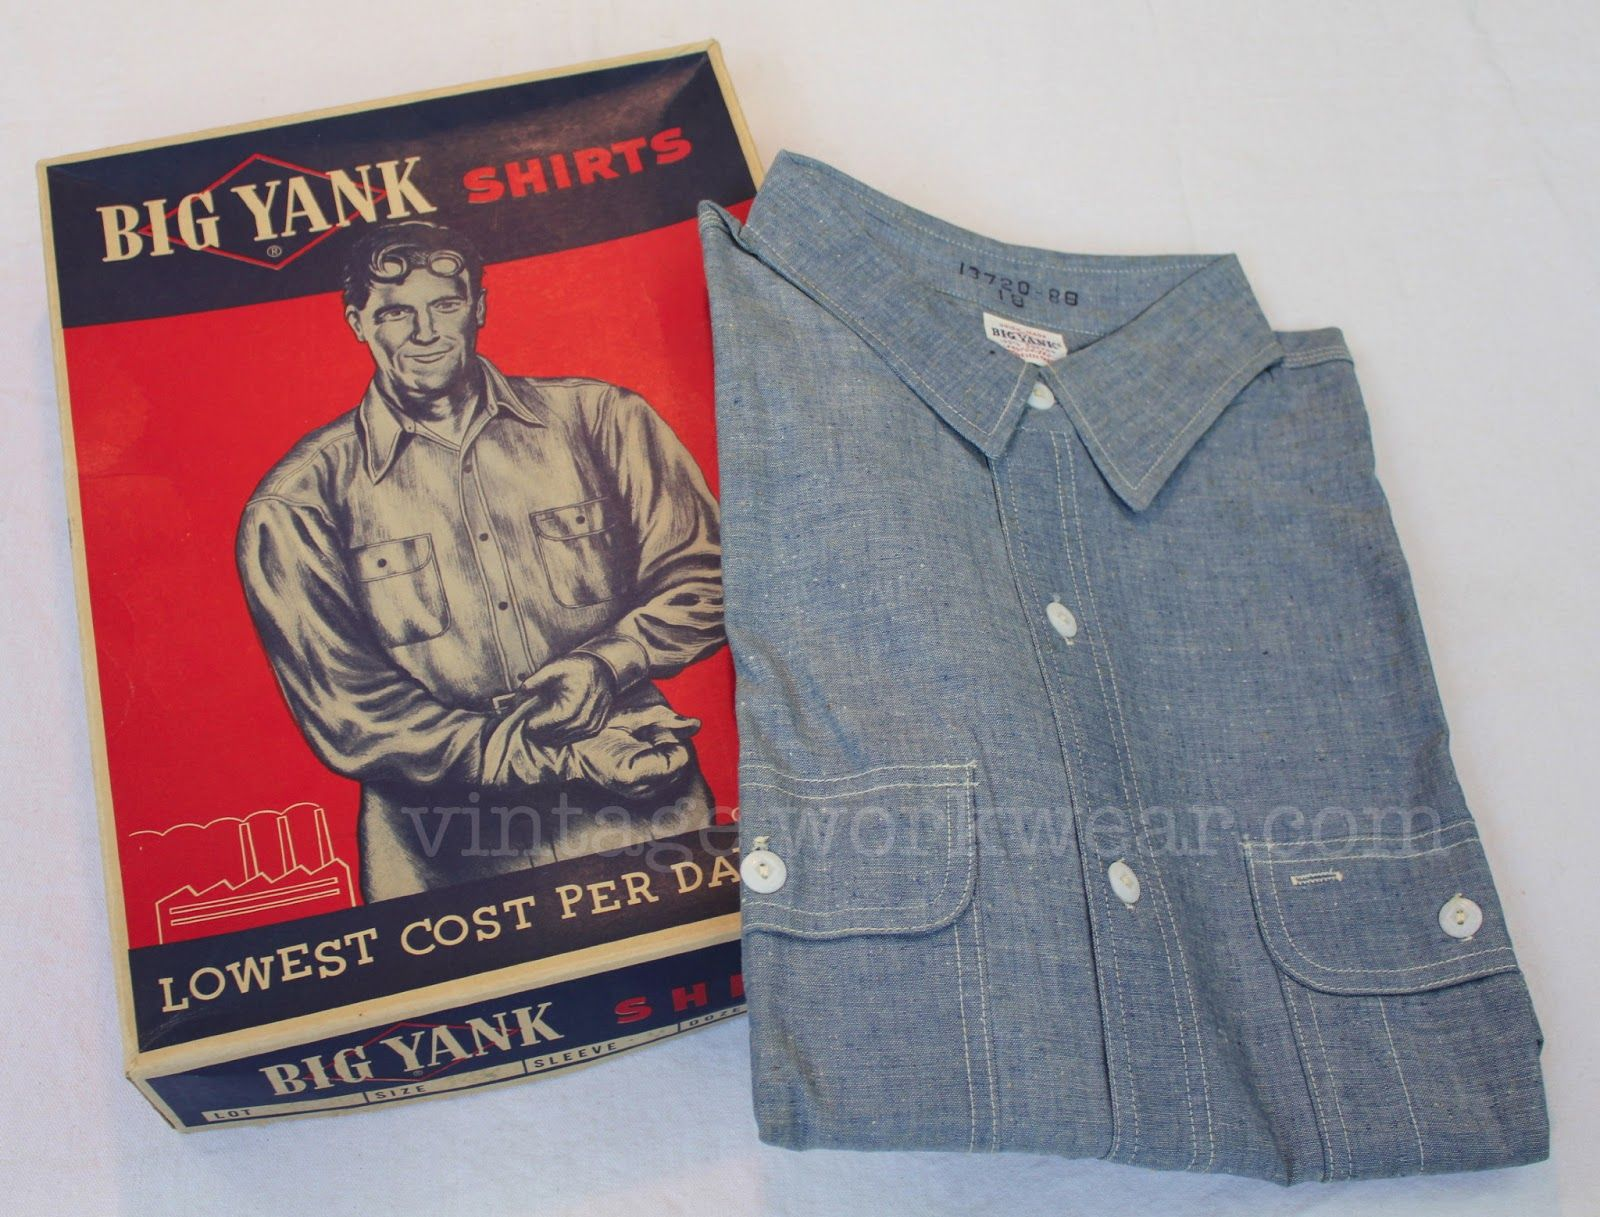 Vintage Big Yank Chambray Work Shirt With Sweat Proof Pocket Vintage Clothing Men Shirts Work Shirts